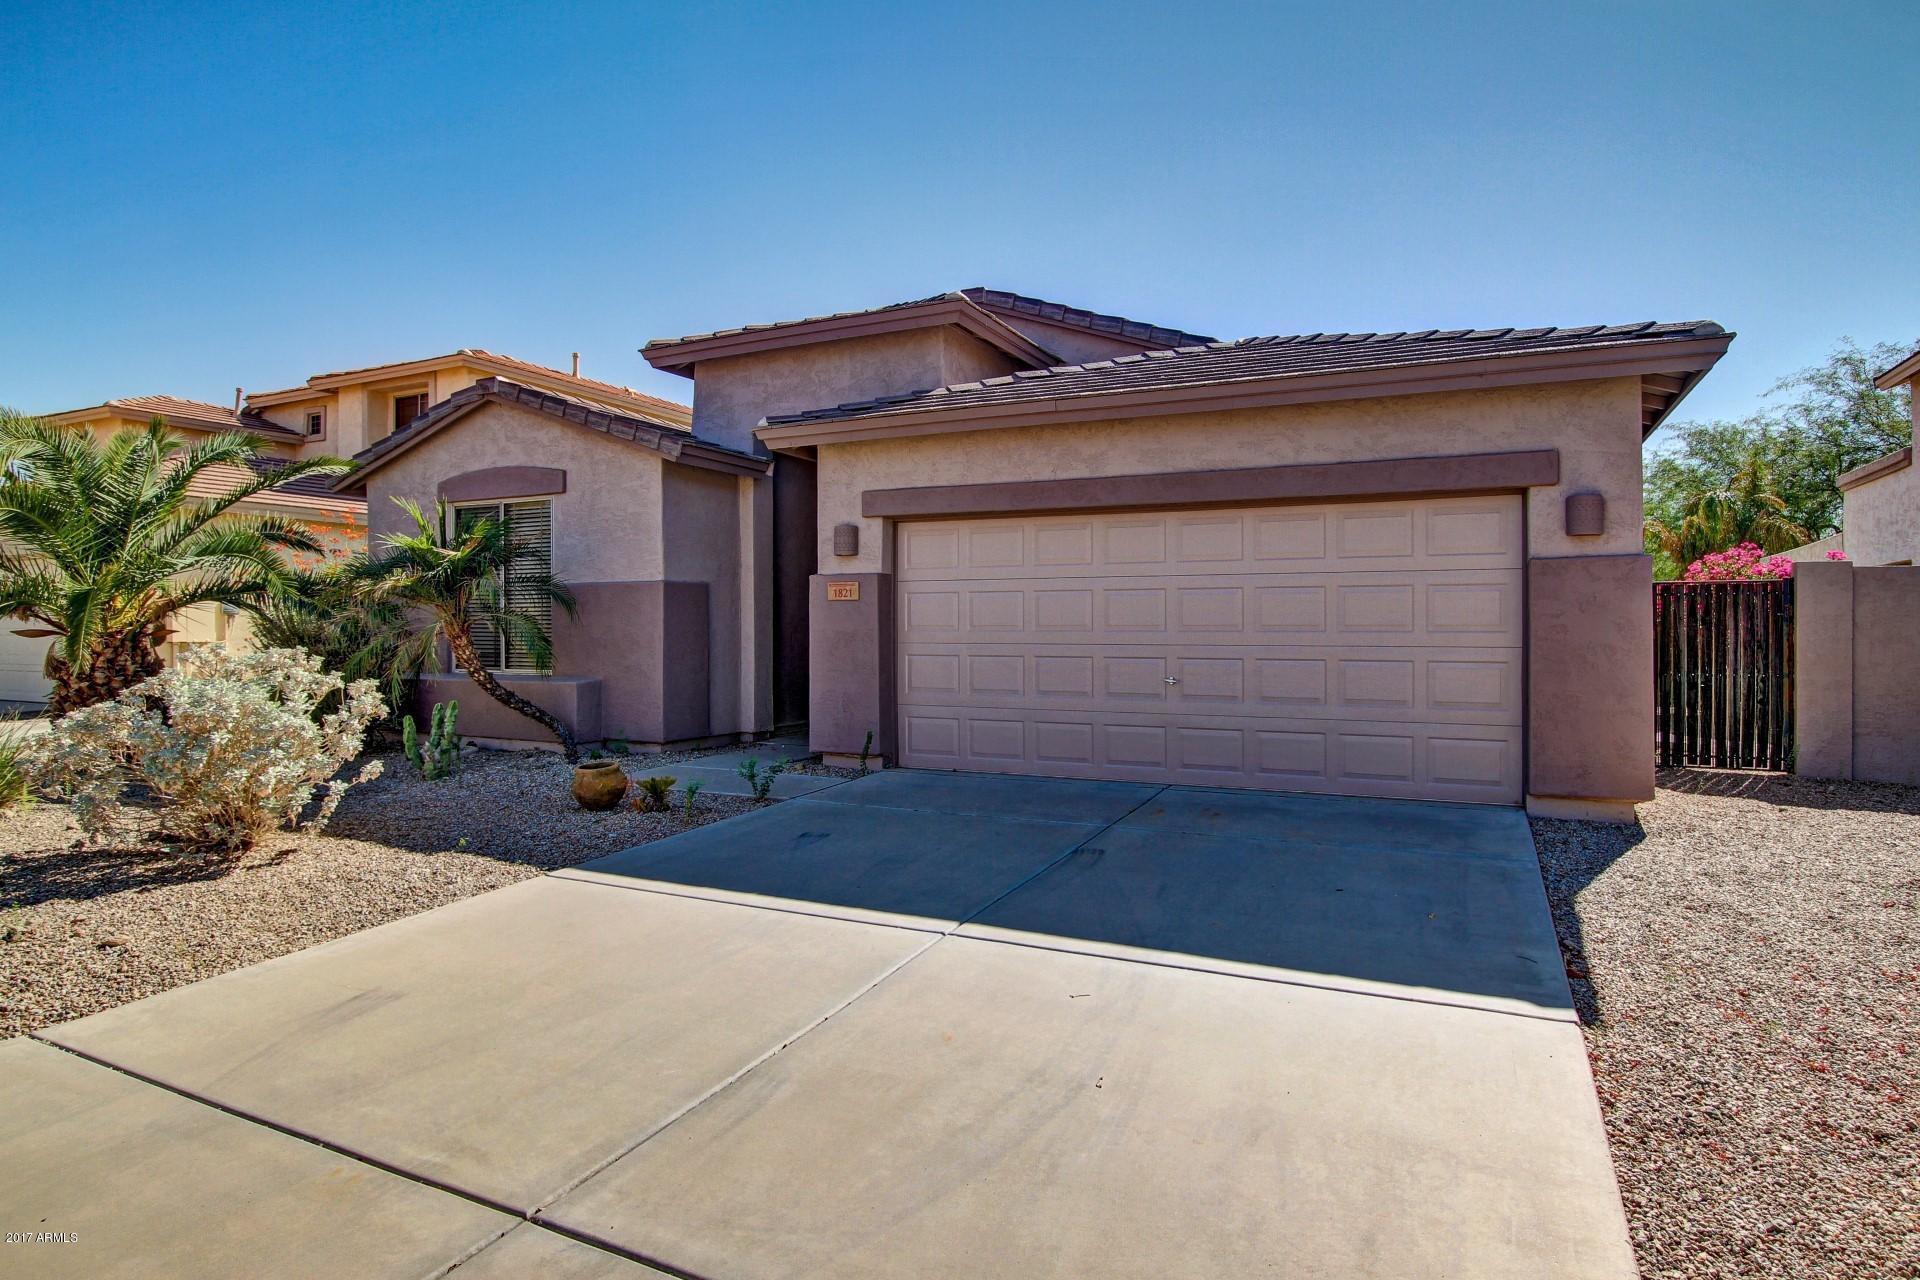 Photo for 1821 W Glenhaven Drive, Phoenix, AZ 85045 (MLS # 5668960)